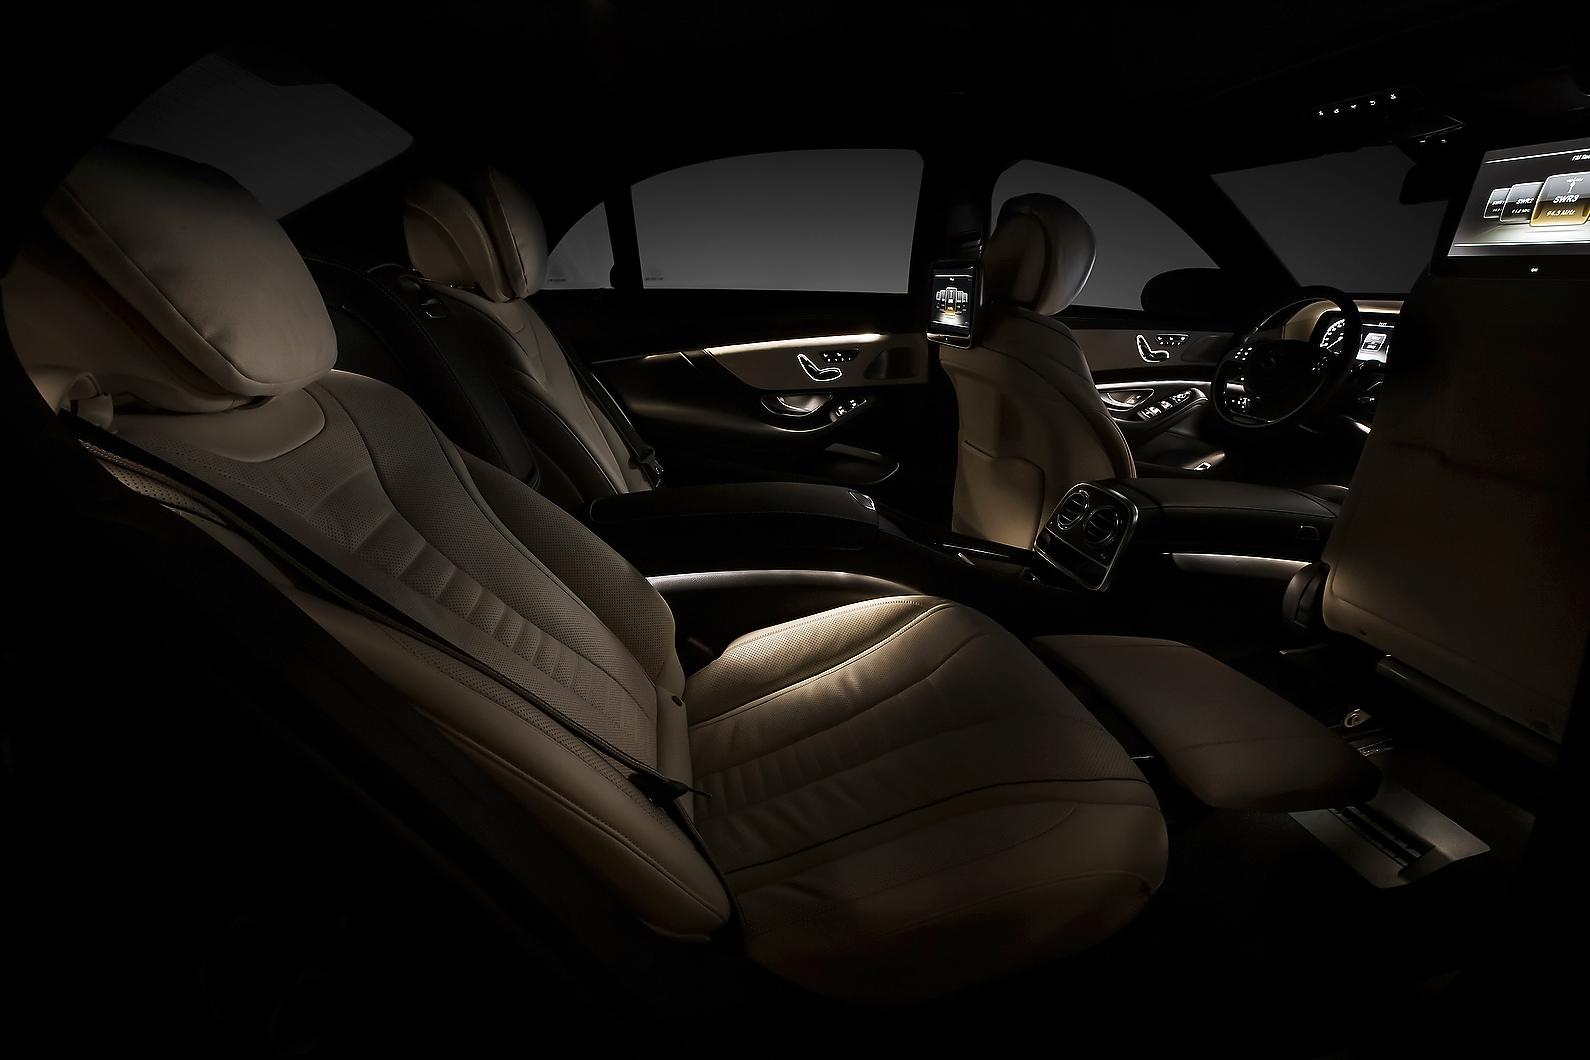 2014 mercedes s class official interior photos released autoevolution. Black Bedroom Furniture Sets. Home Design Ideas